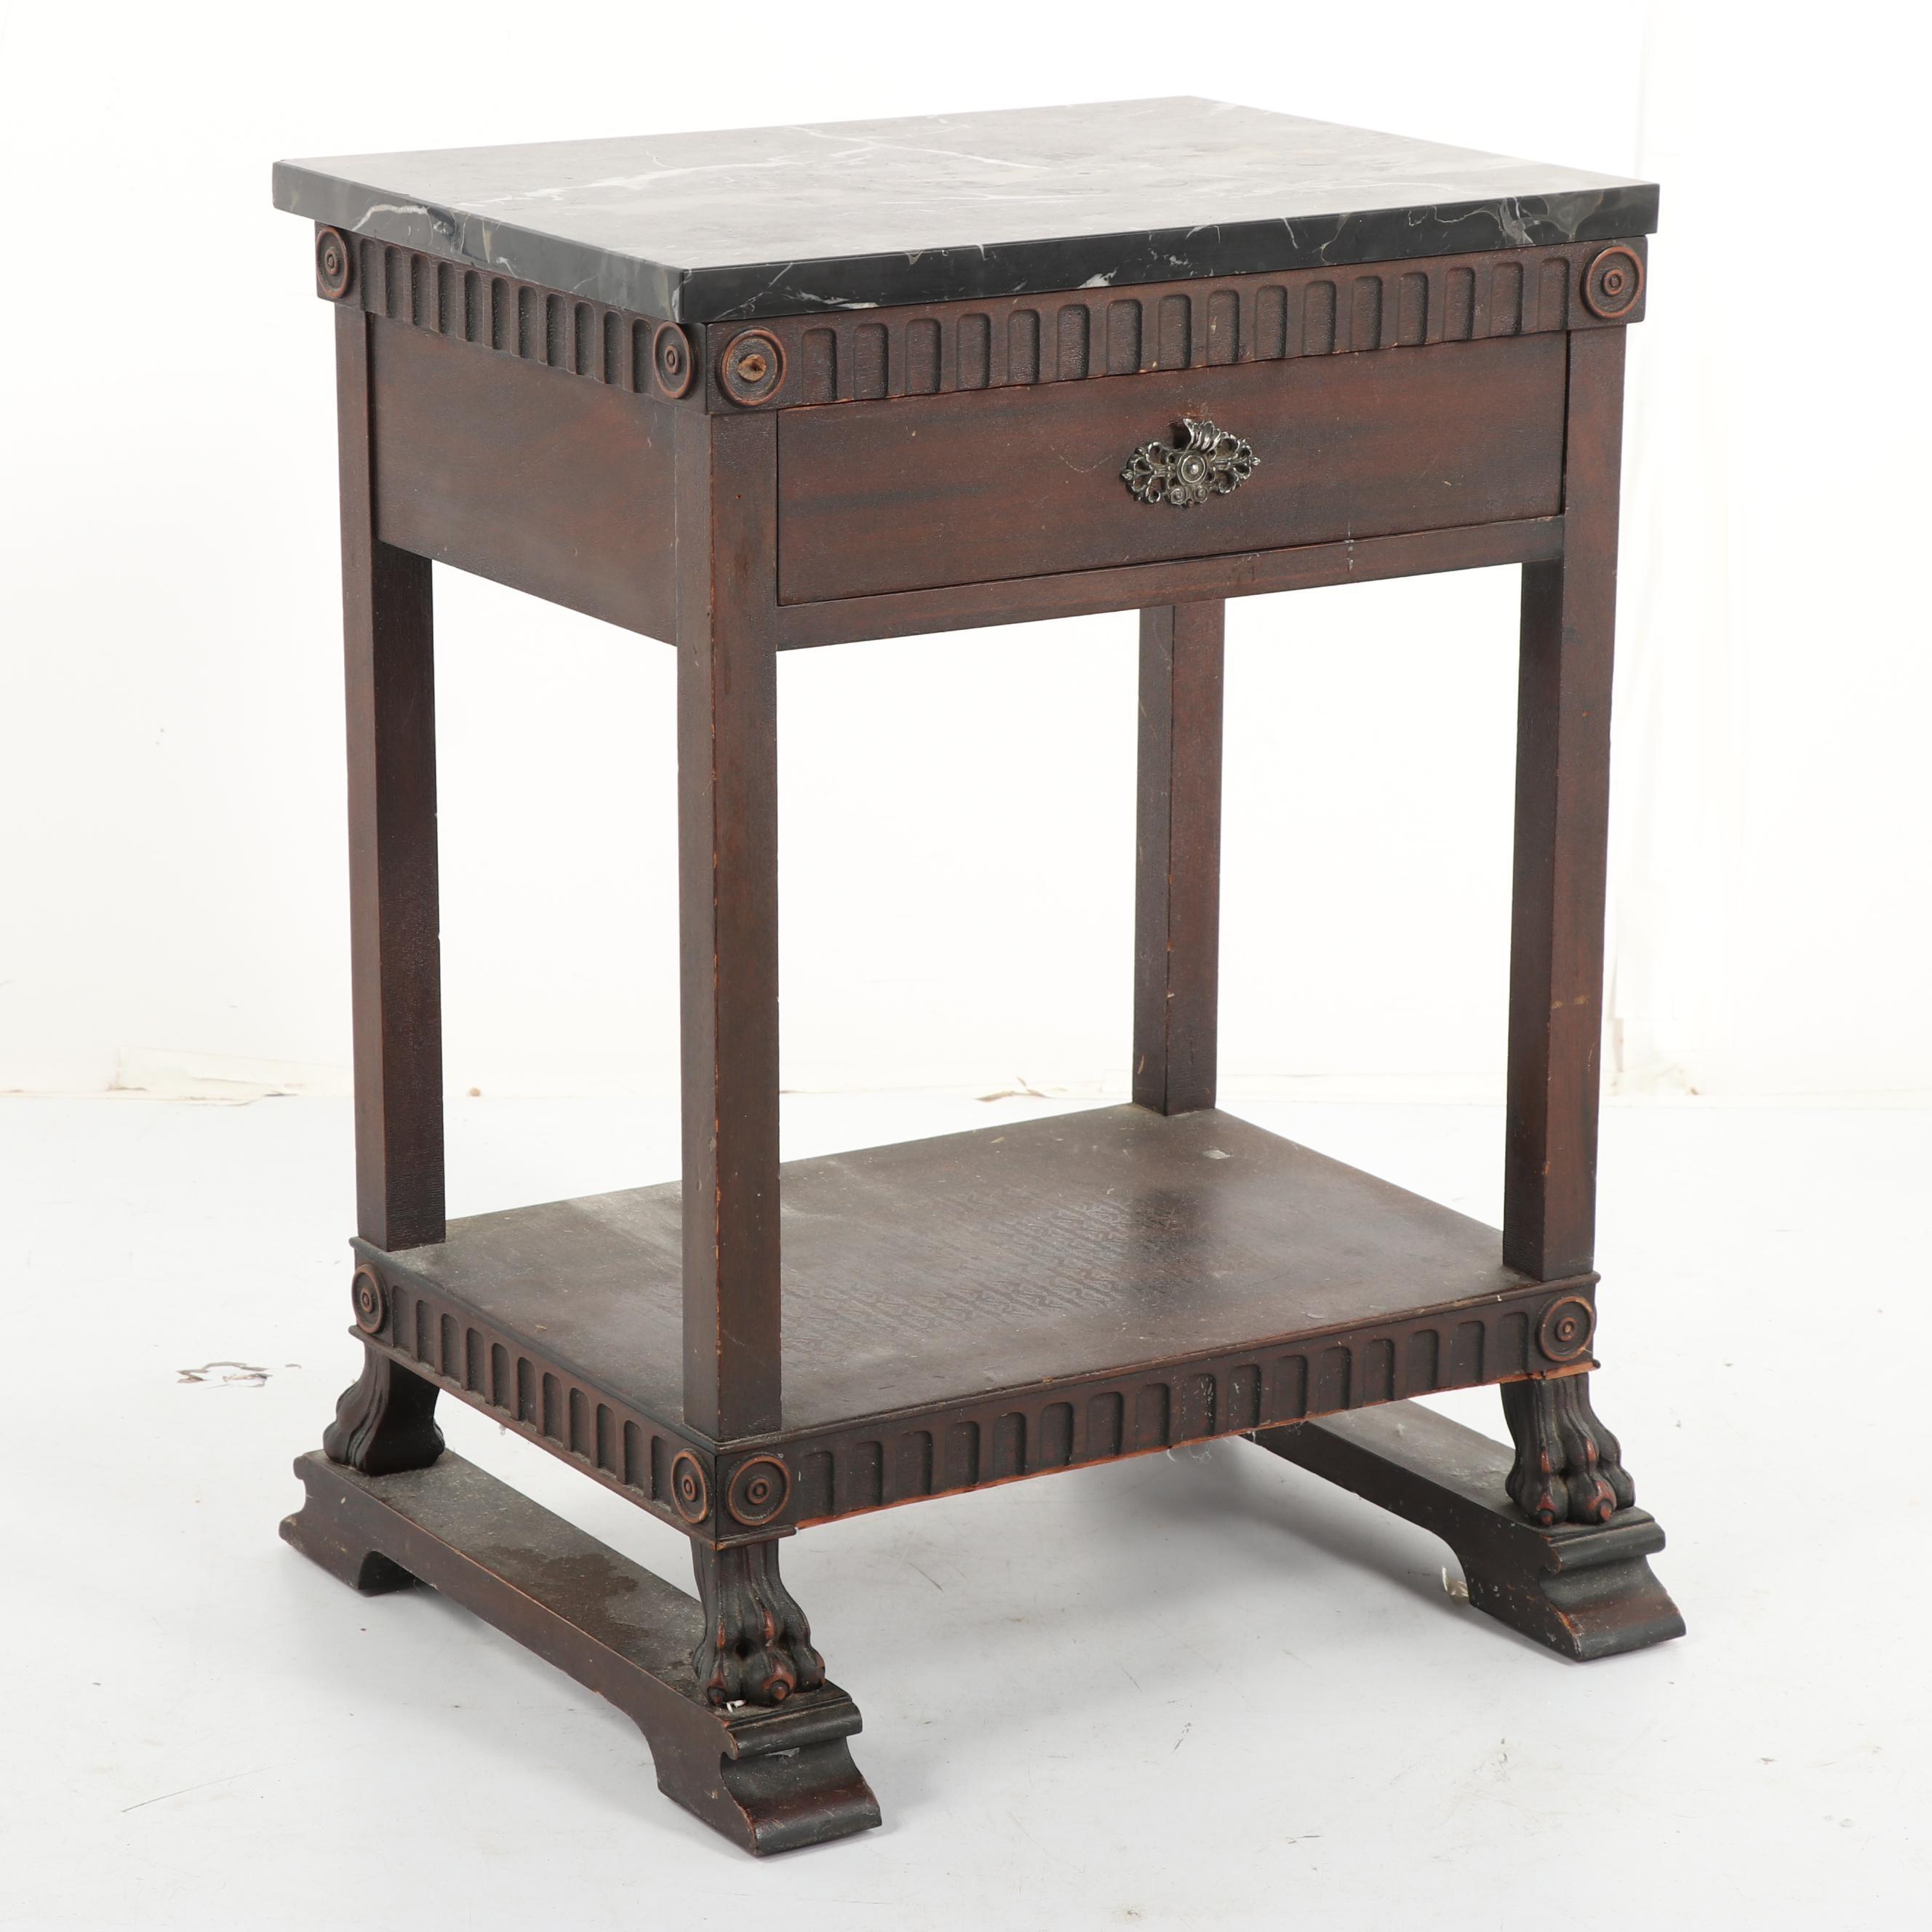 Renaissance Revival Style Mahogany and Stone Side Table, Mid 20th Century